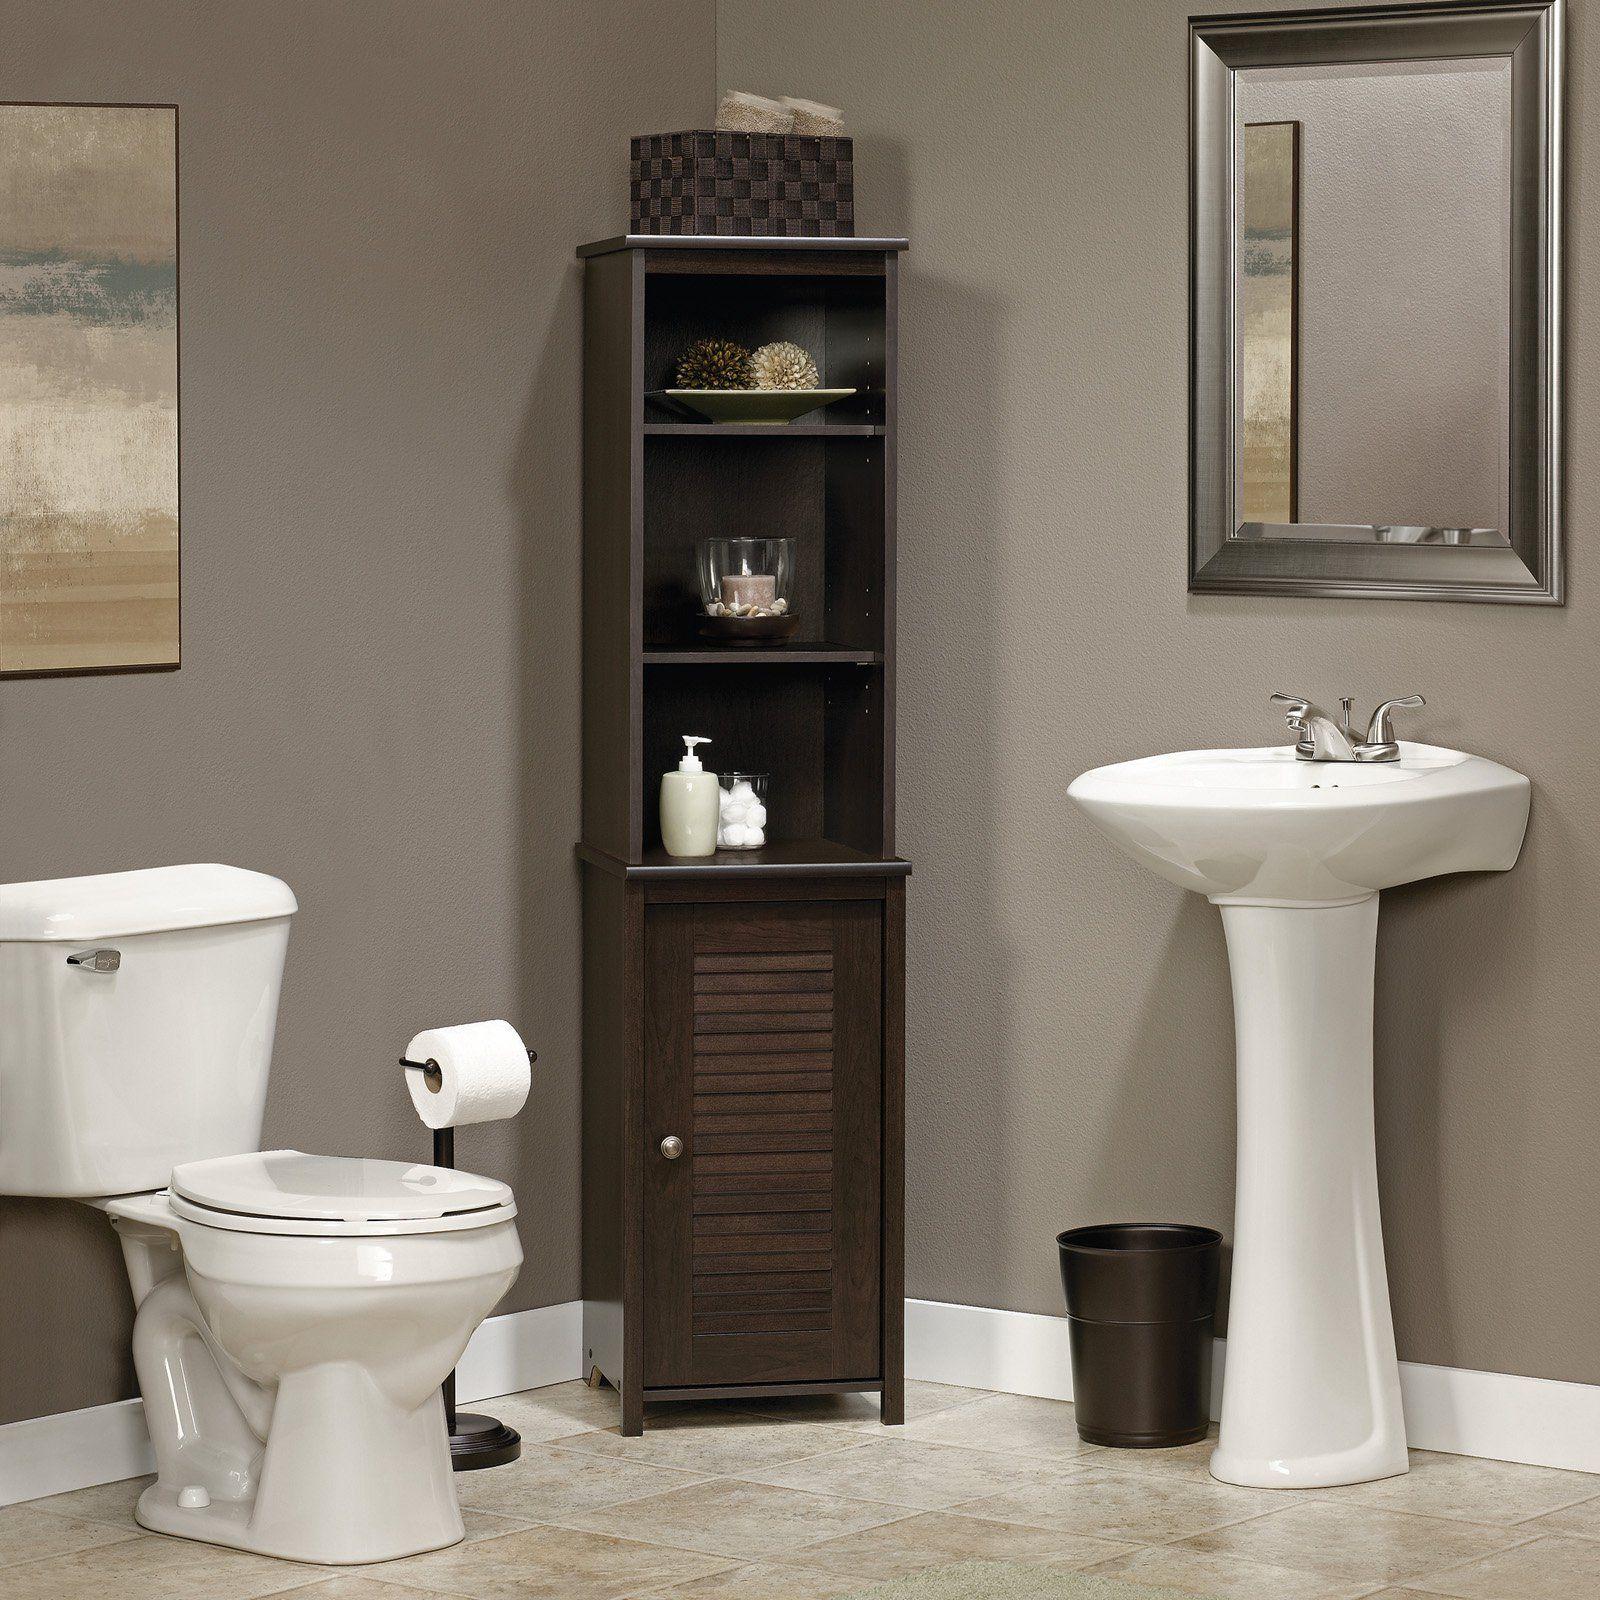 Sauder Peppercorn Linen Tower 414817 Products Bathroom